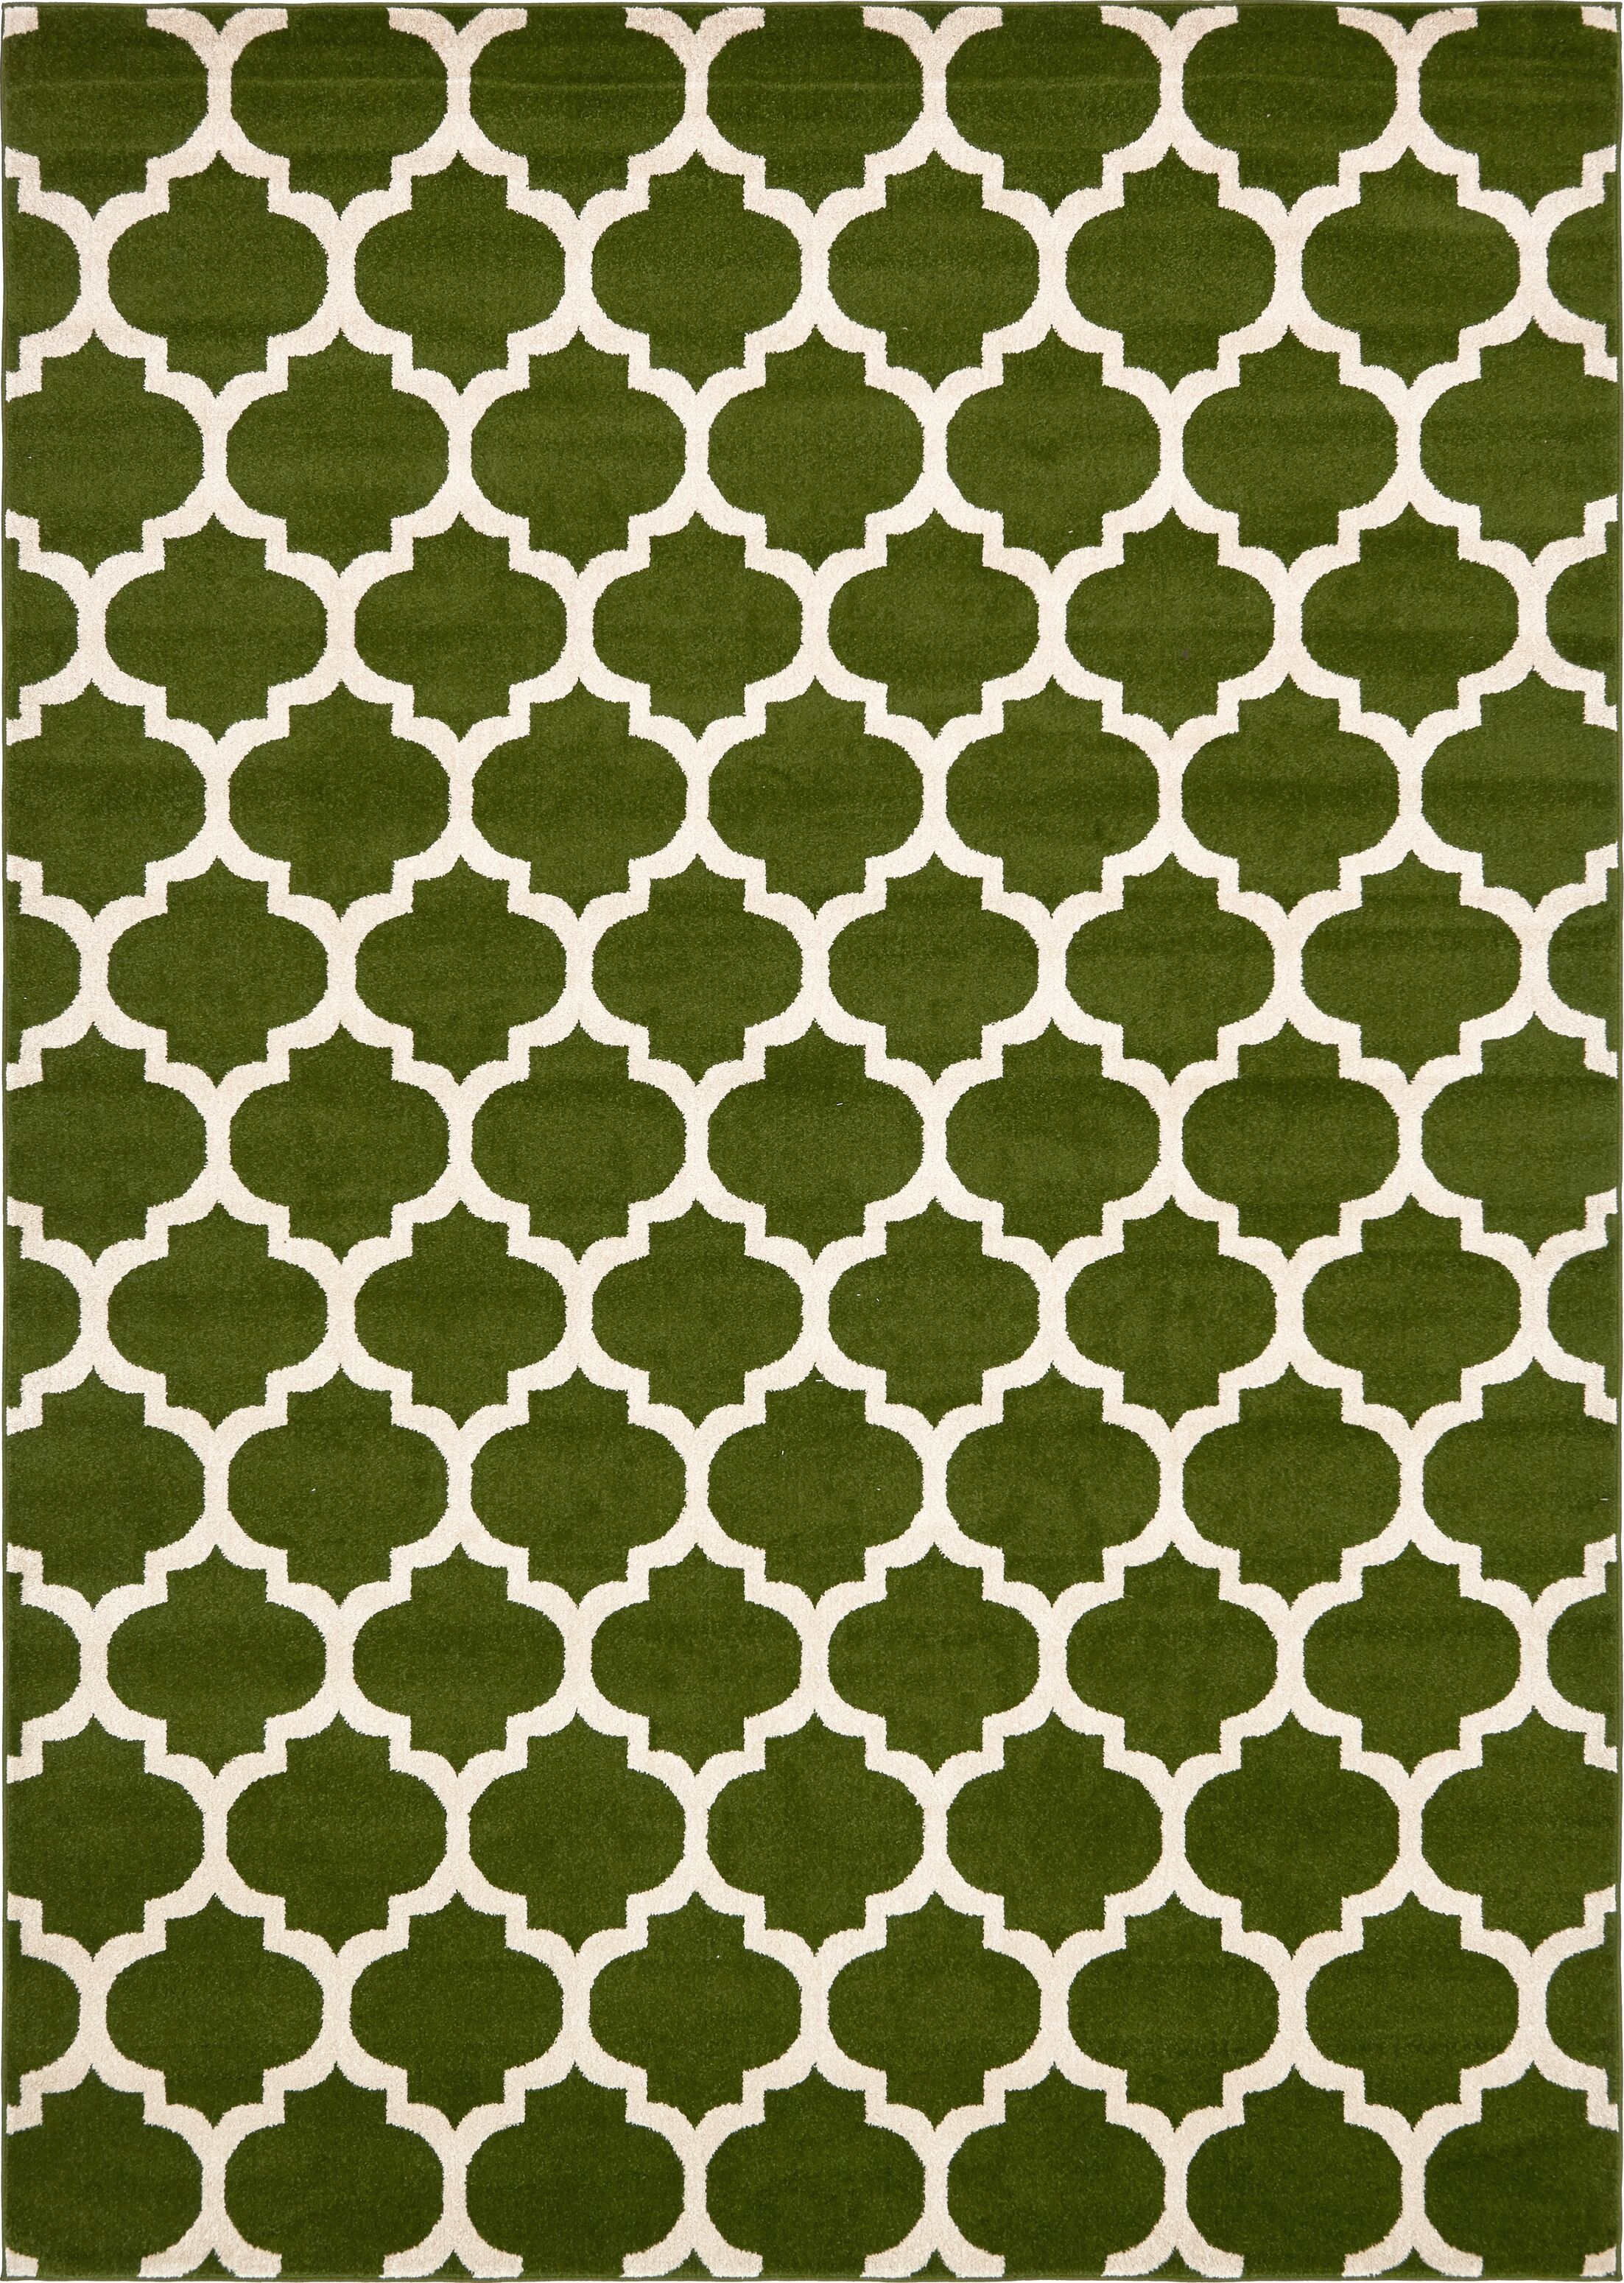 Moore Green/Beige Area Rug Rug Size: Rectangle 8' x 11'